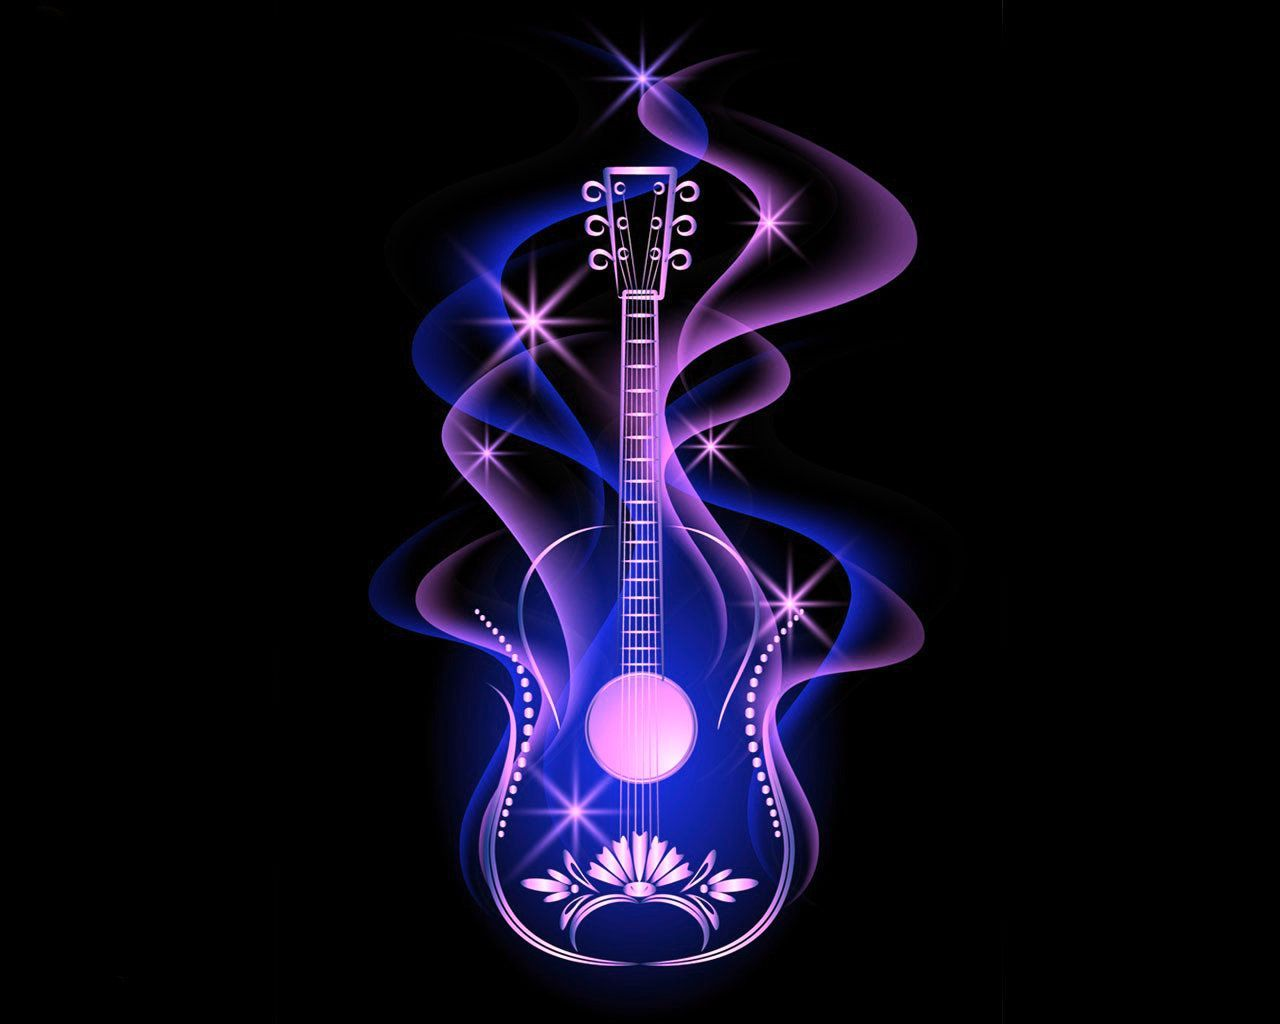 55 Colorful Guitar Wallpapers Download At Wallpaperbro Wallpaper Neon Wallpaper Guitar Wallpaper Iphone